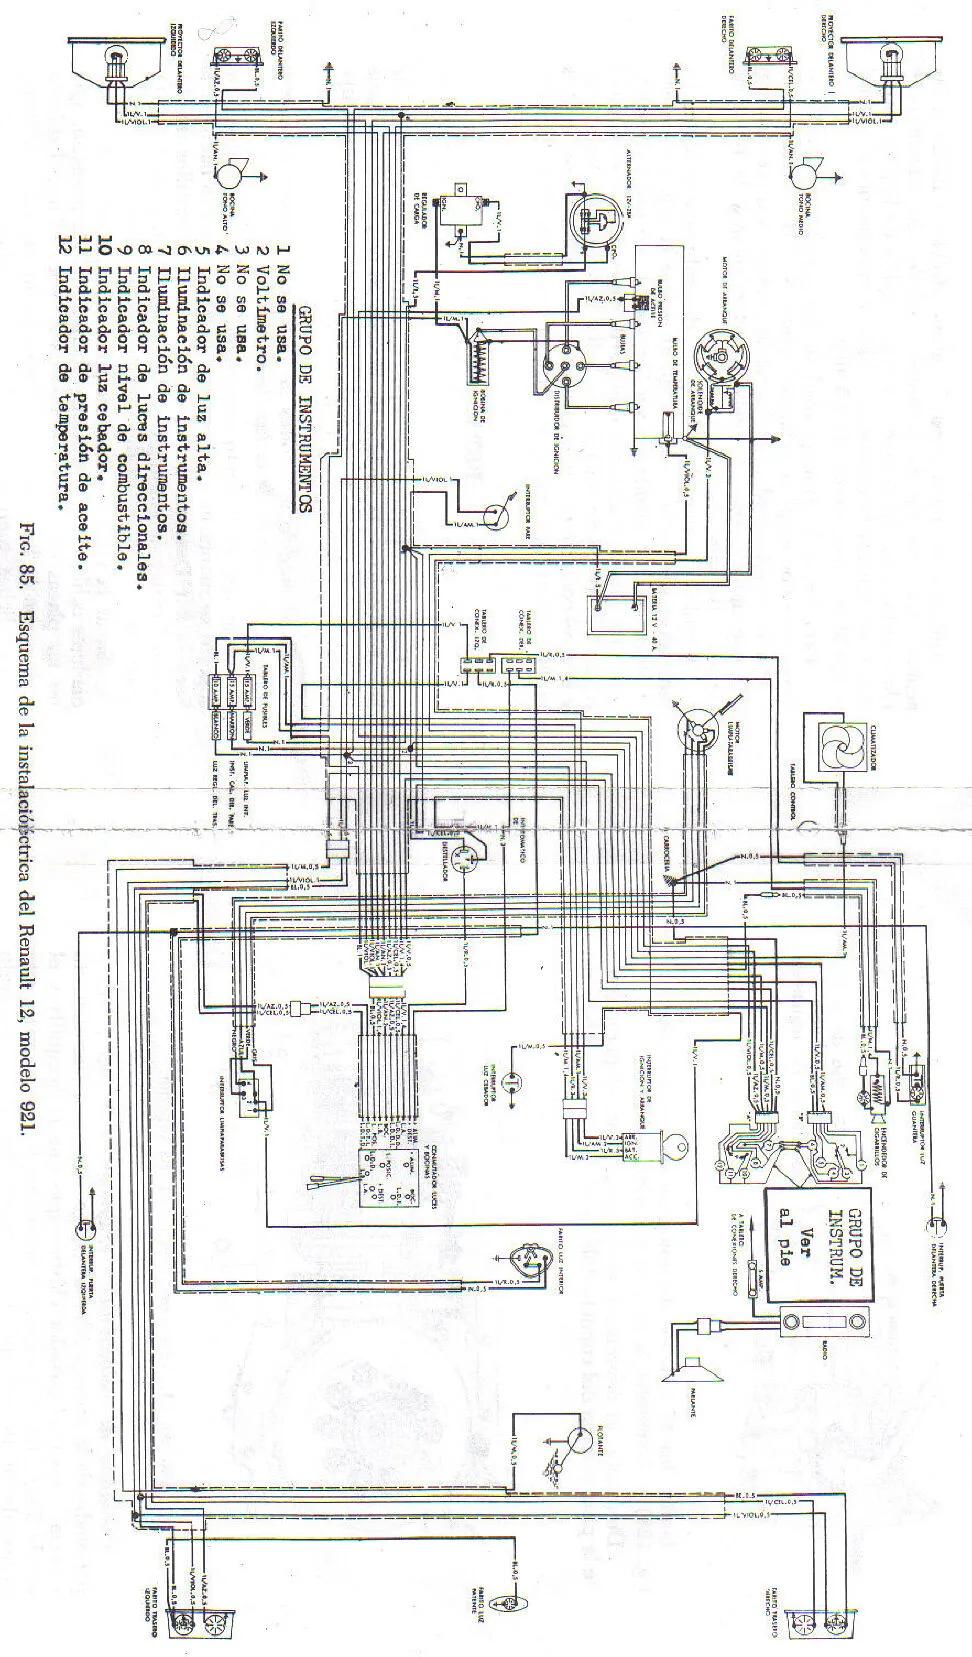 Conga 990 Manual Pdf. Epub Torrents herunterladen